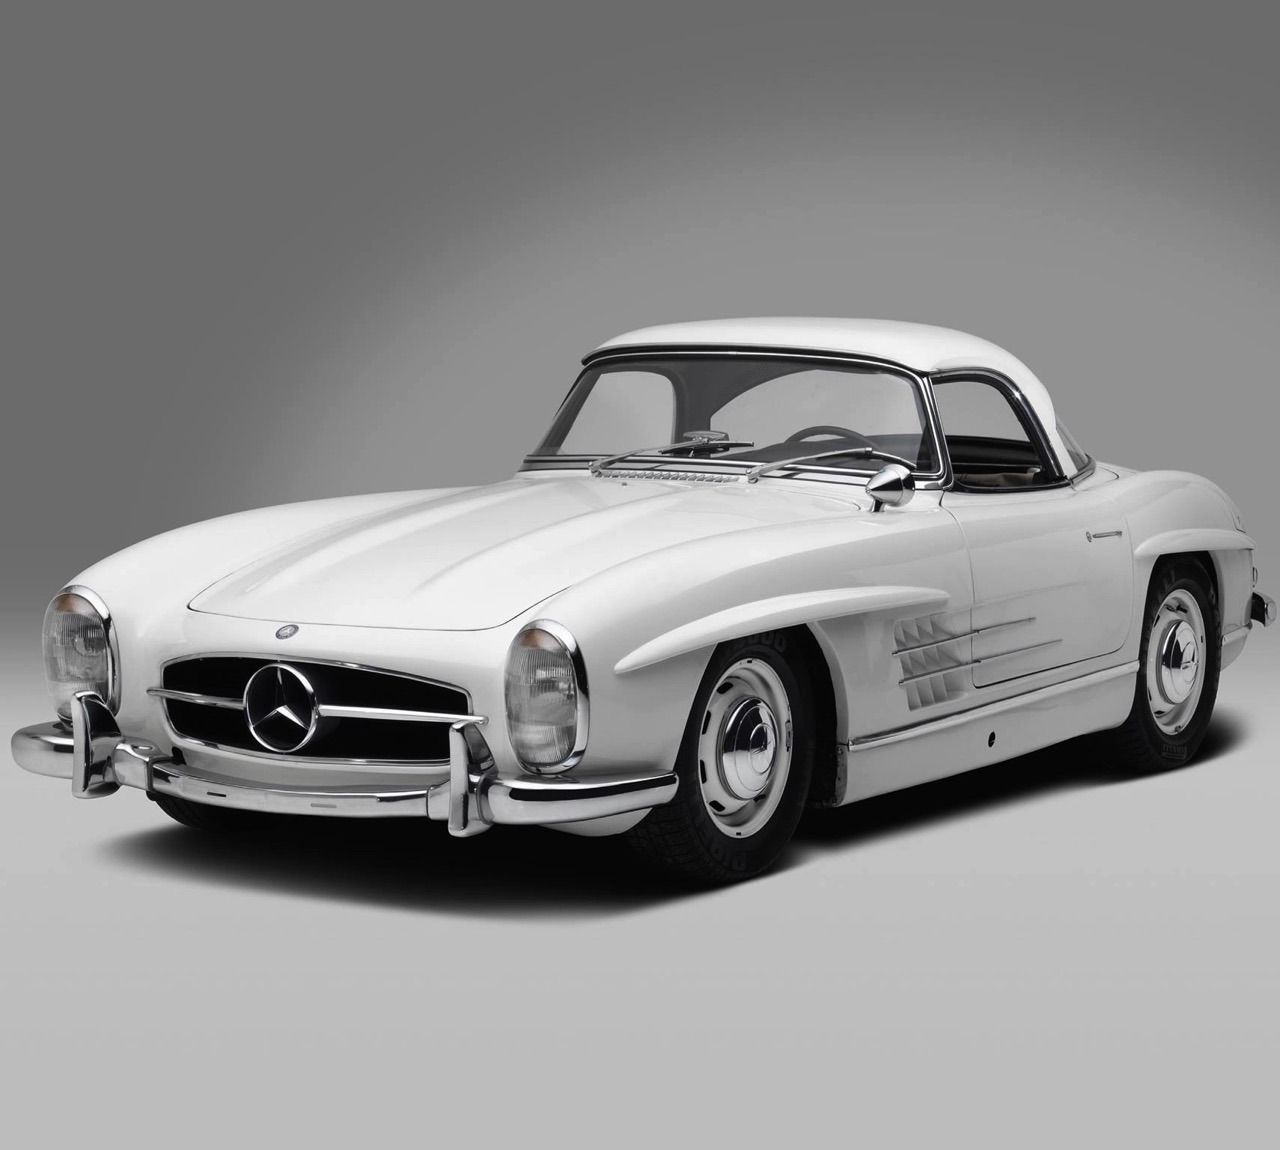 1961 Mercedes Benz 300 Sl Roadster Mercedesclassiccars With